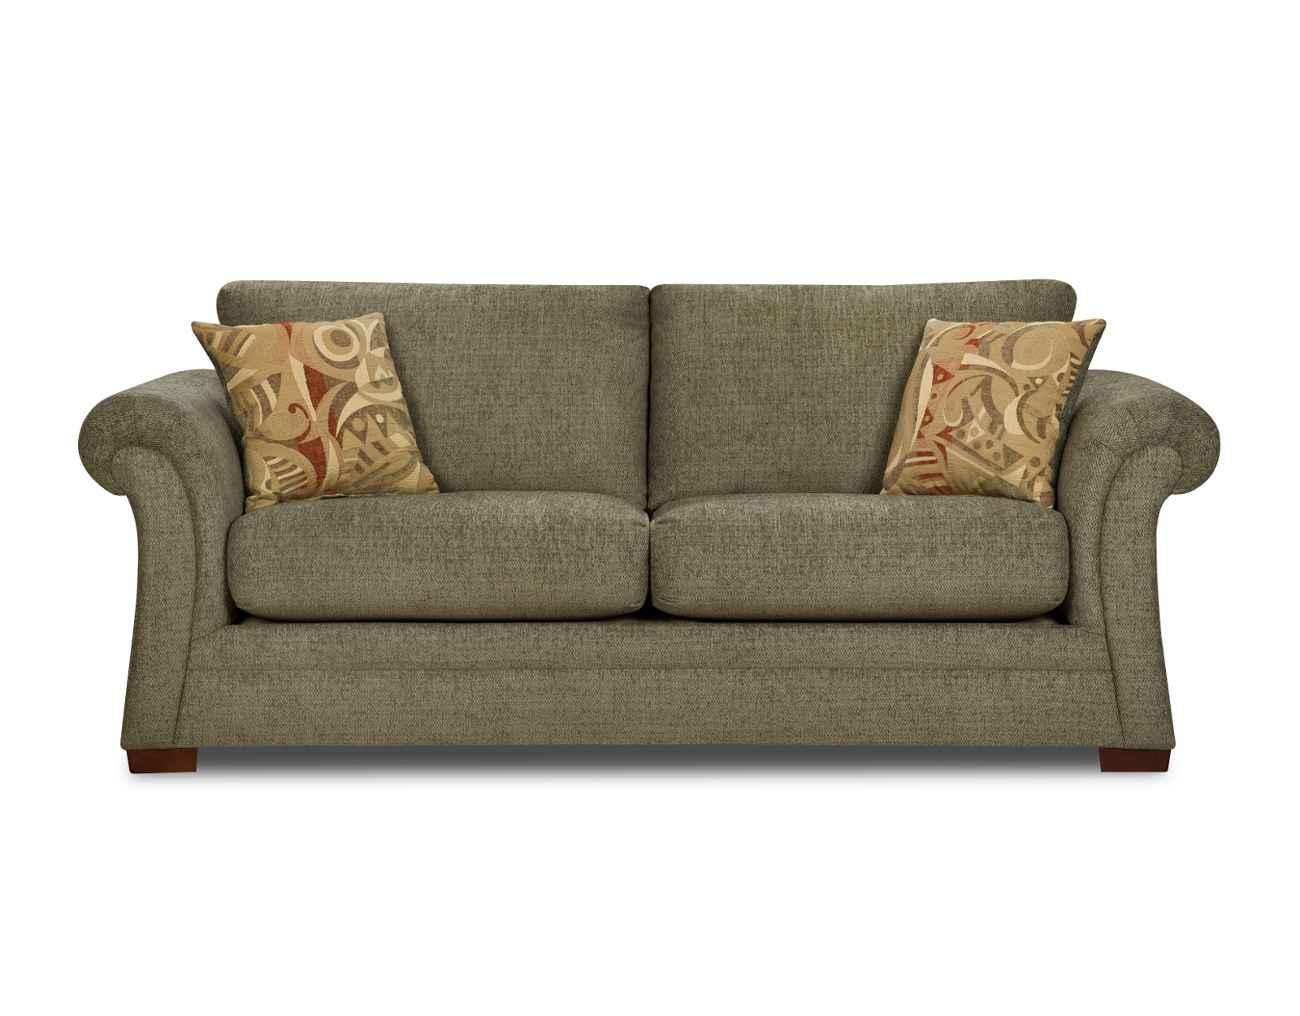 where to buy affordable sofa the company calgary ashley furniture feel home